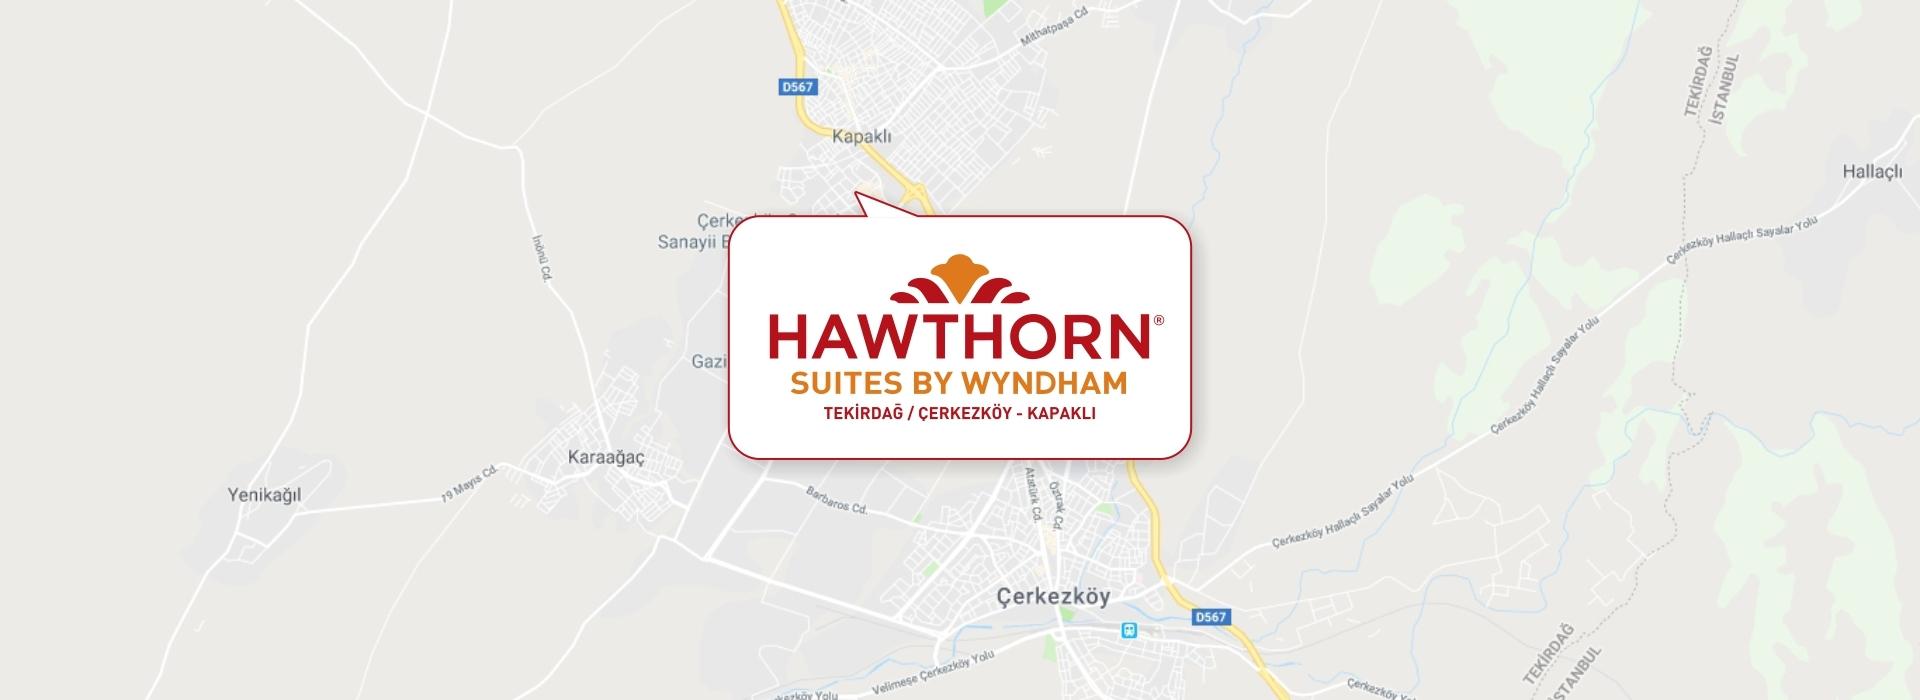 hawthorncerkezkoy-map-haritada-yerimiz-002